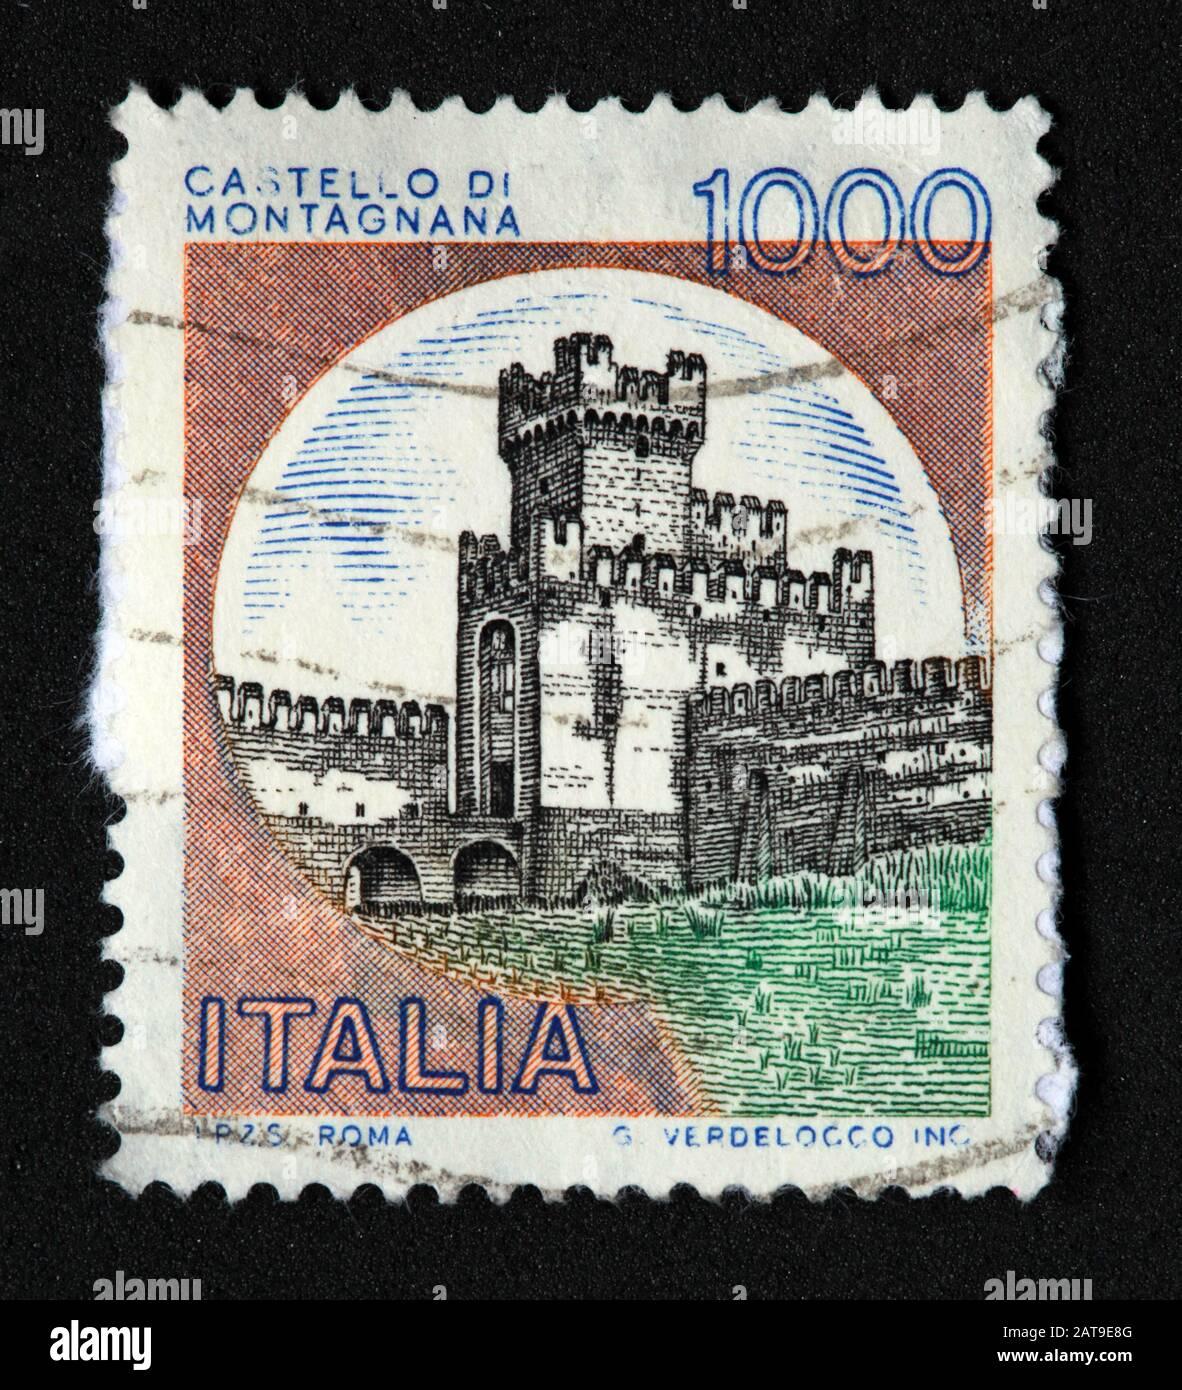 Hotpixuk,@Hotpixuk,GoTonySmith,stamp,postal,franked,frank,used stamps,used franked,used,franked stamp,from envelope,history,historic,old,Italy,Italian,Italia,Italy Stamp,Rome,Roma,1,000,1000,Italia 1000Lire,1000 Lira,Castello Di Montagnana,G.Verdelocco inc,italian stamp,franked Italian stamp,used Italian stamp,Italy stamp